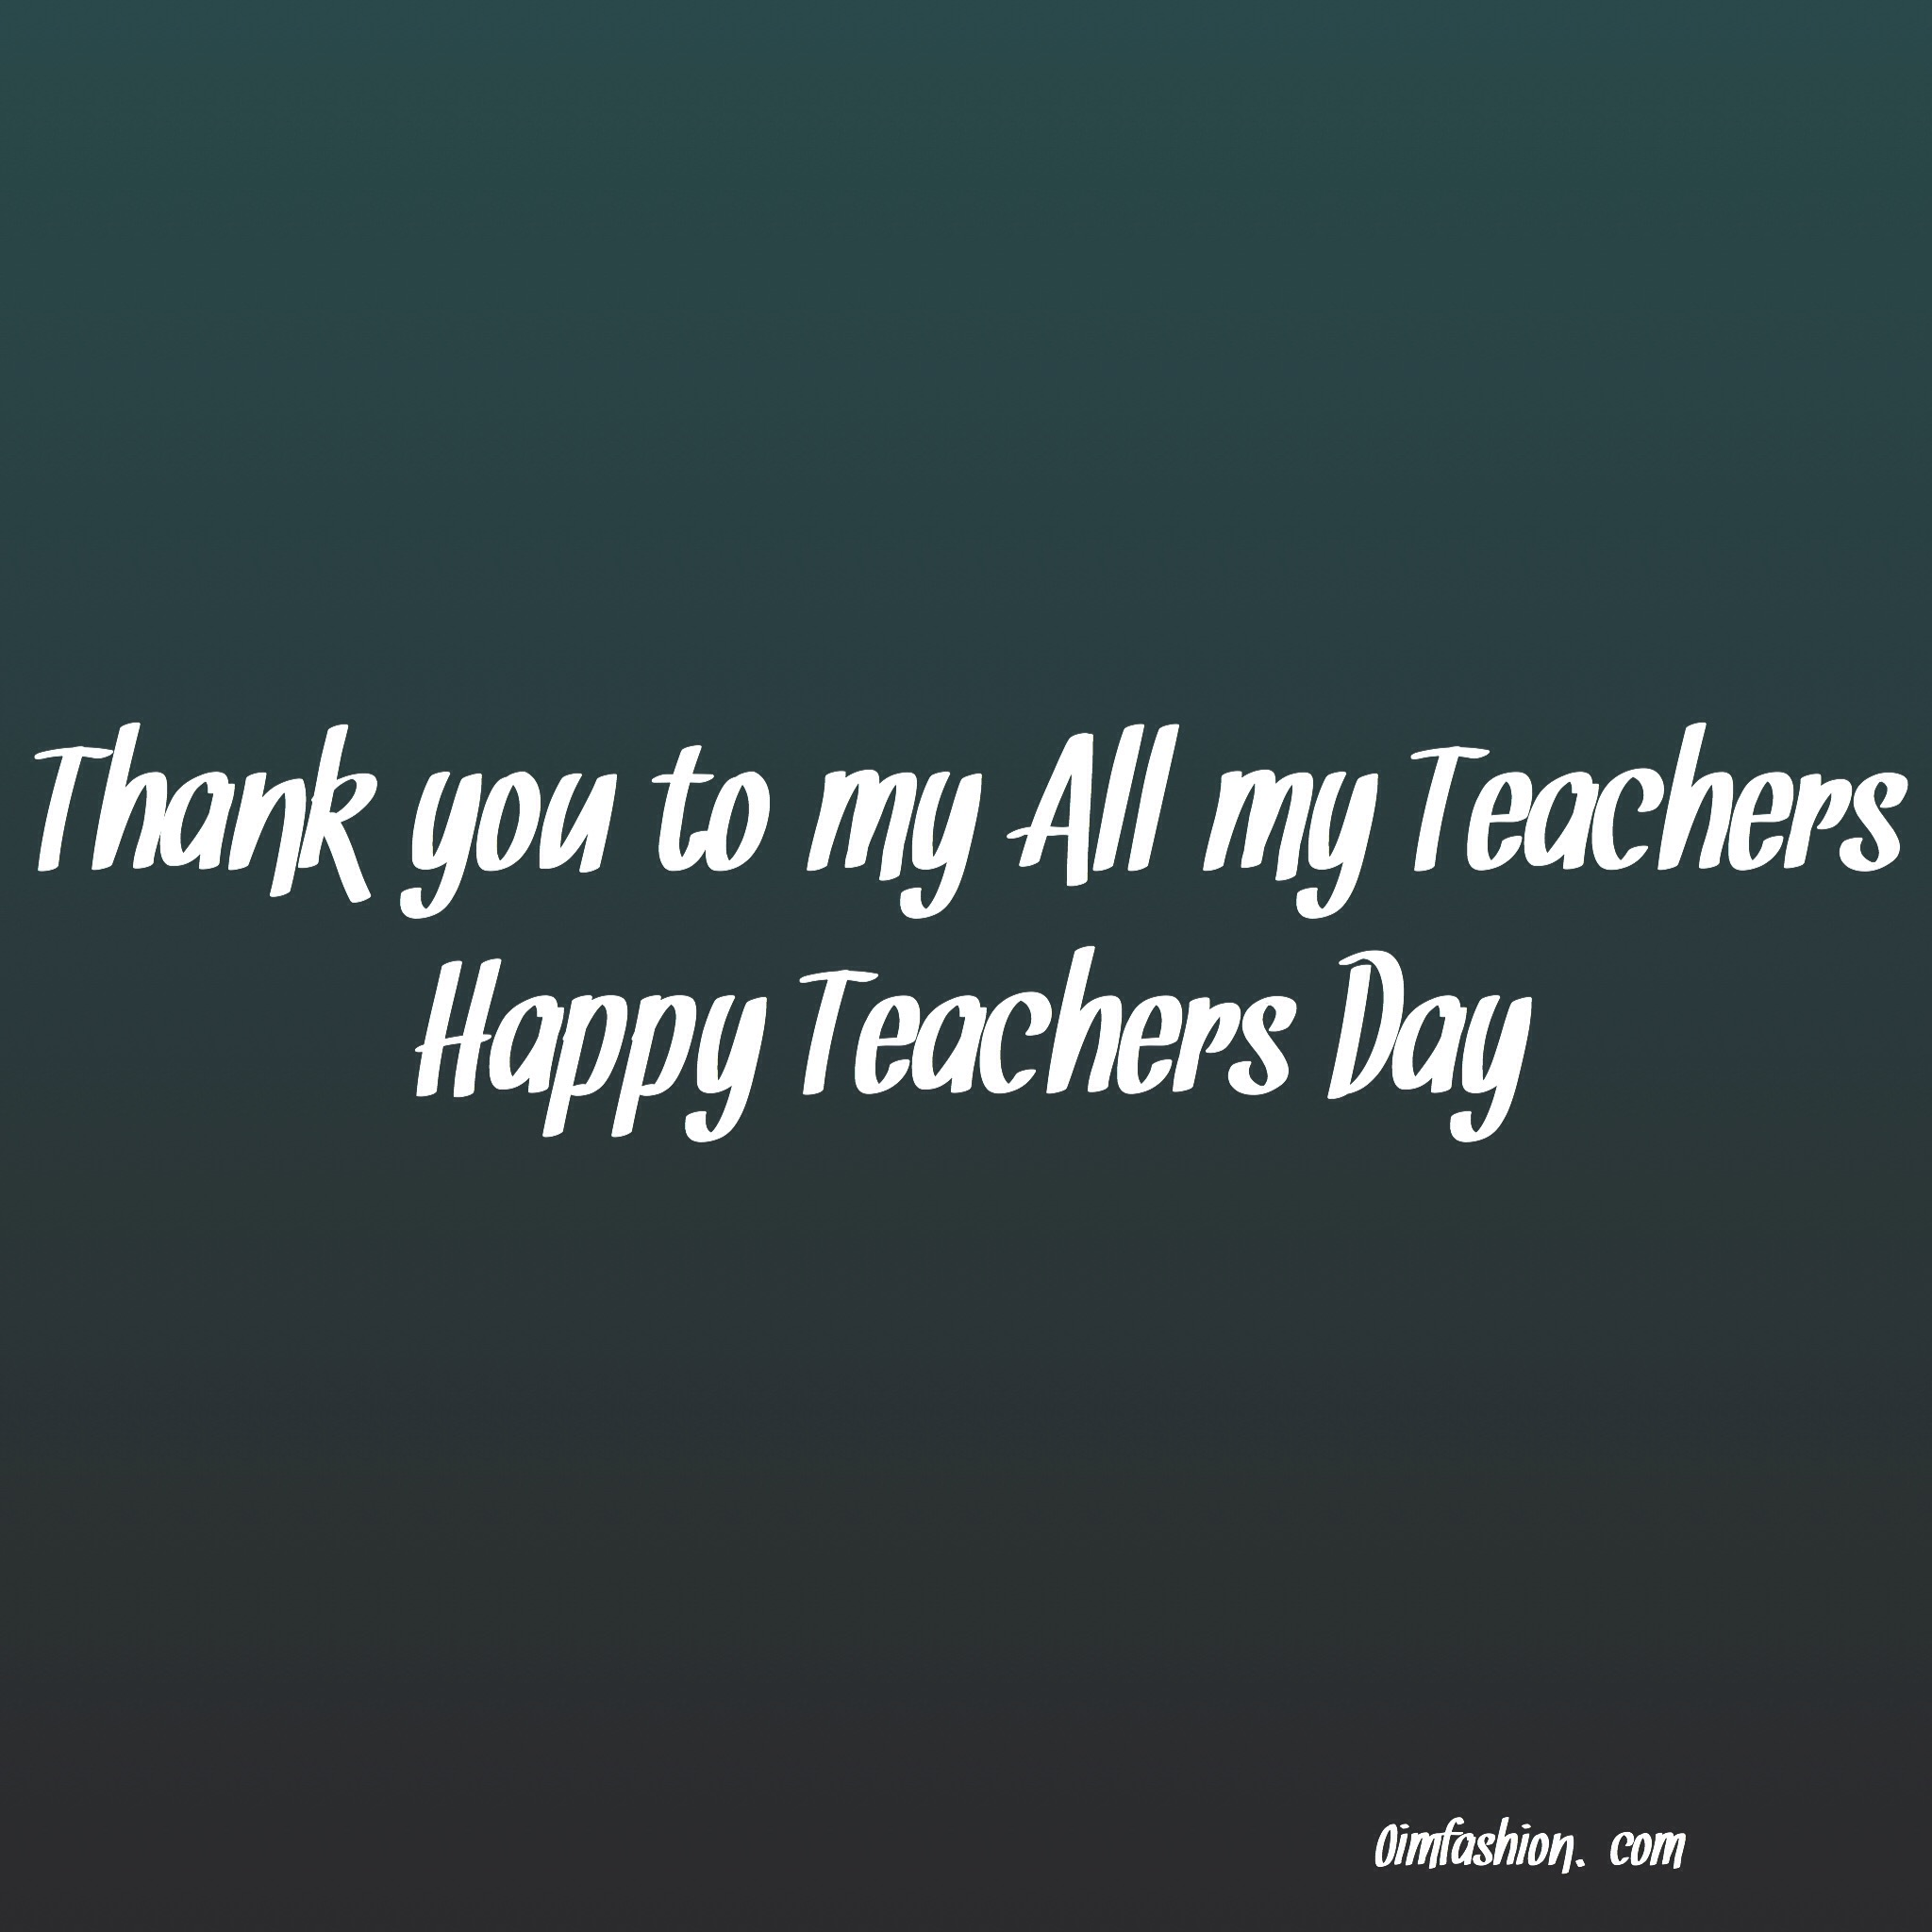 30 Hd Happy Teachers Day Wallpapers